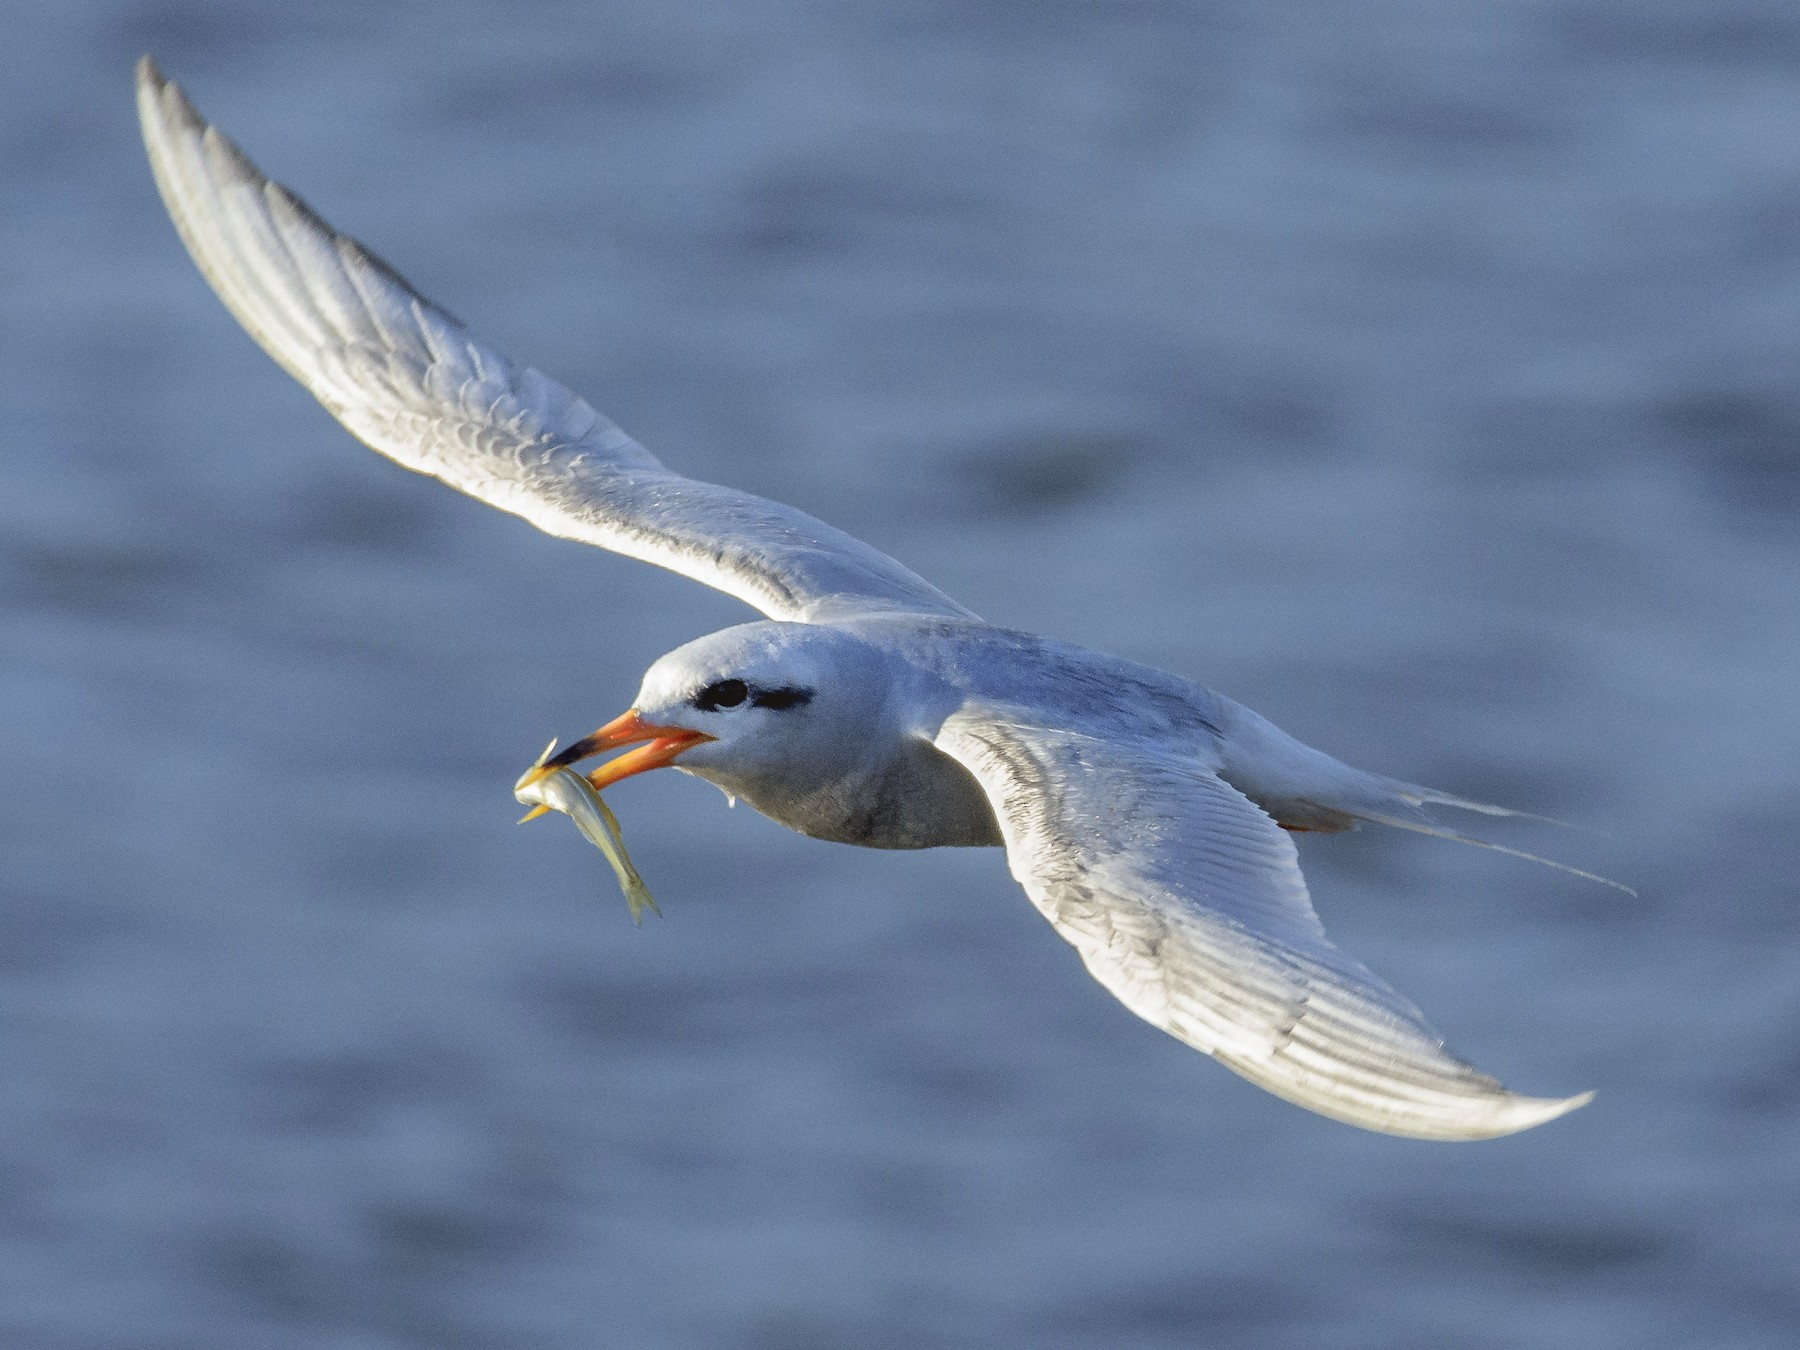 Snowy-crowned Tern - VERONICA ARAYA GARCIA